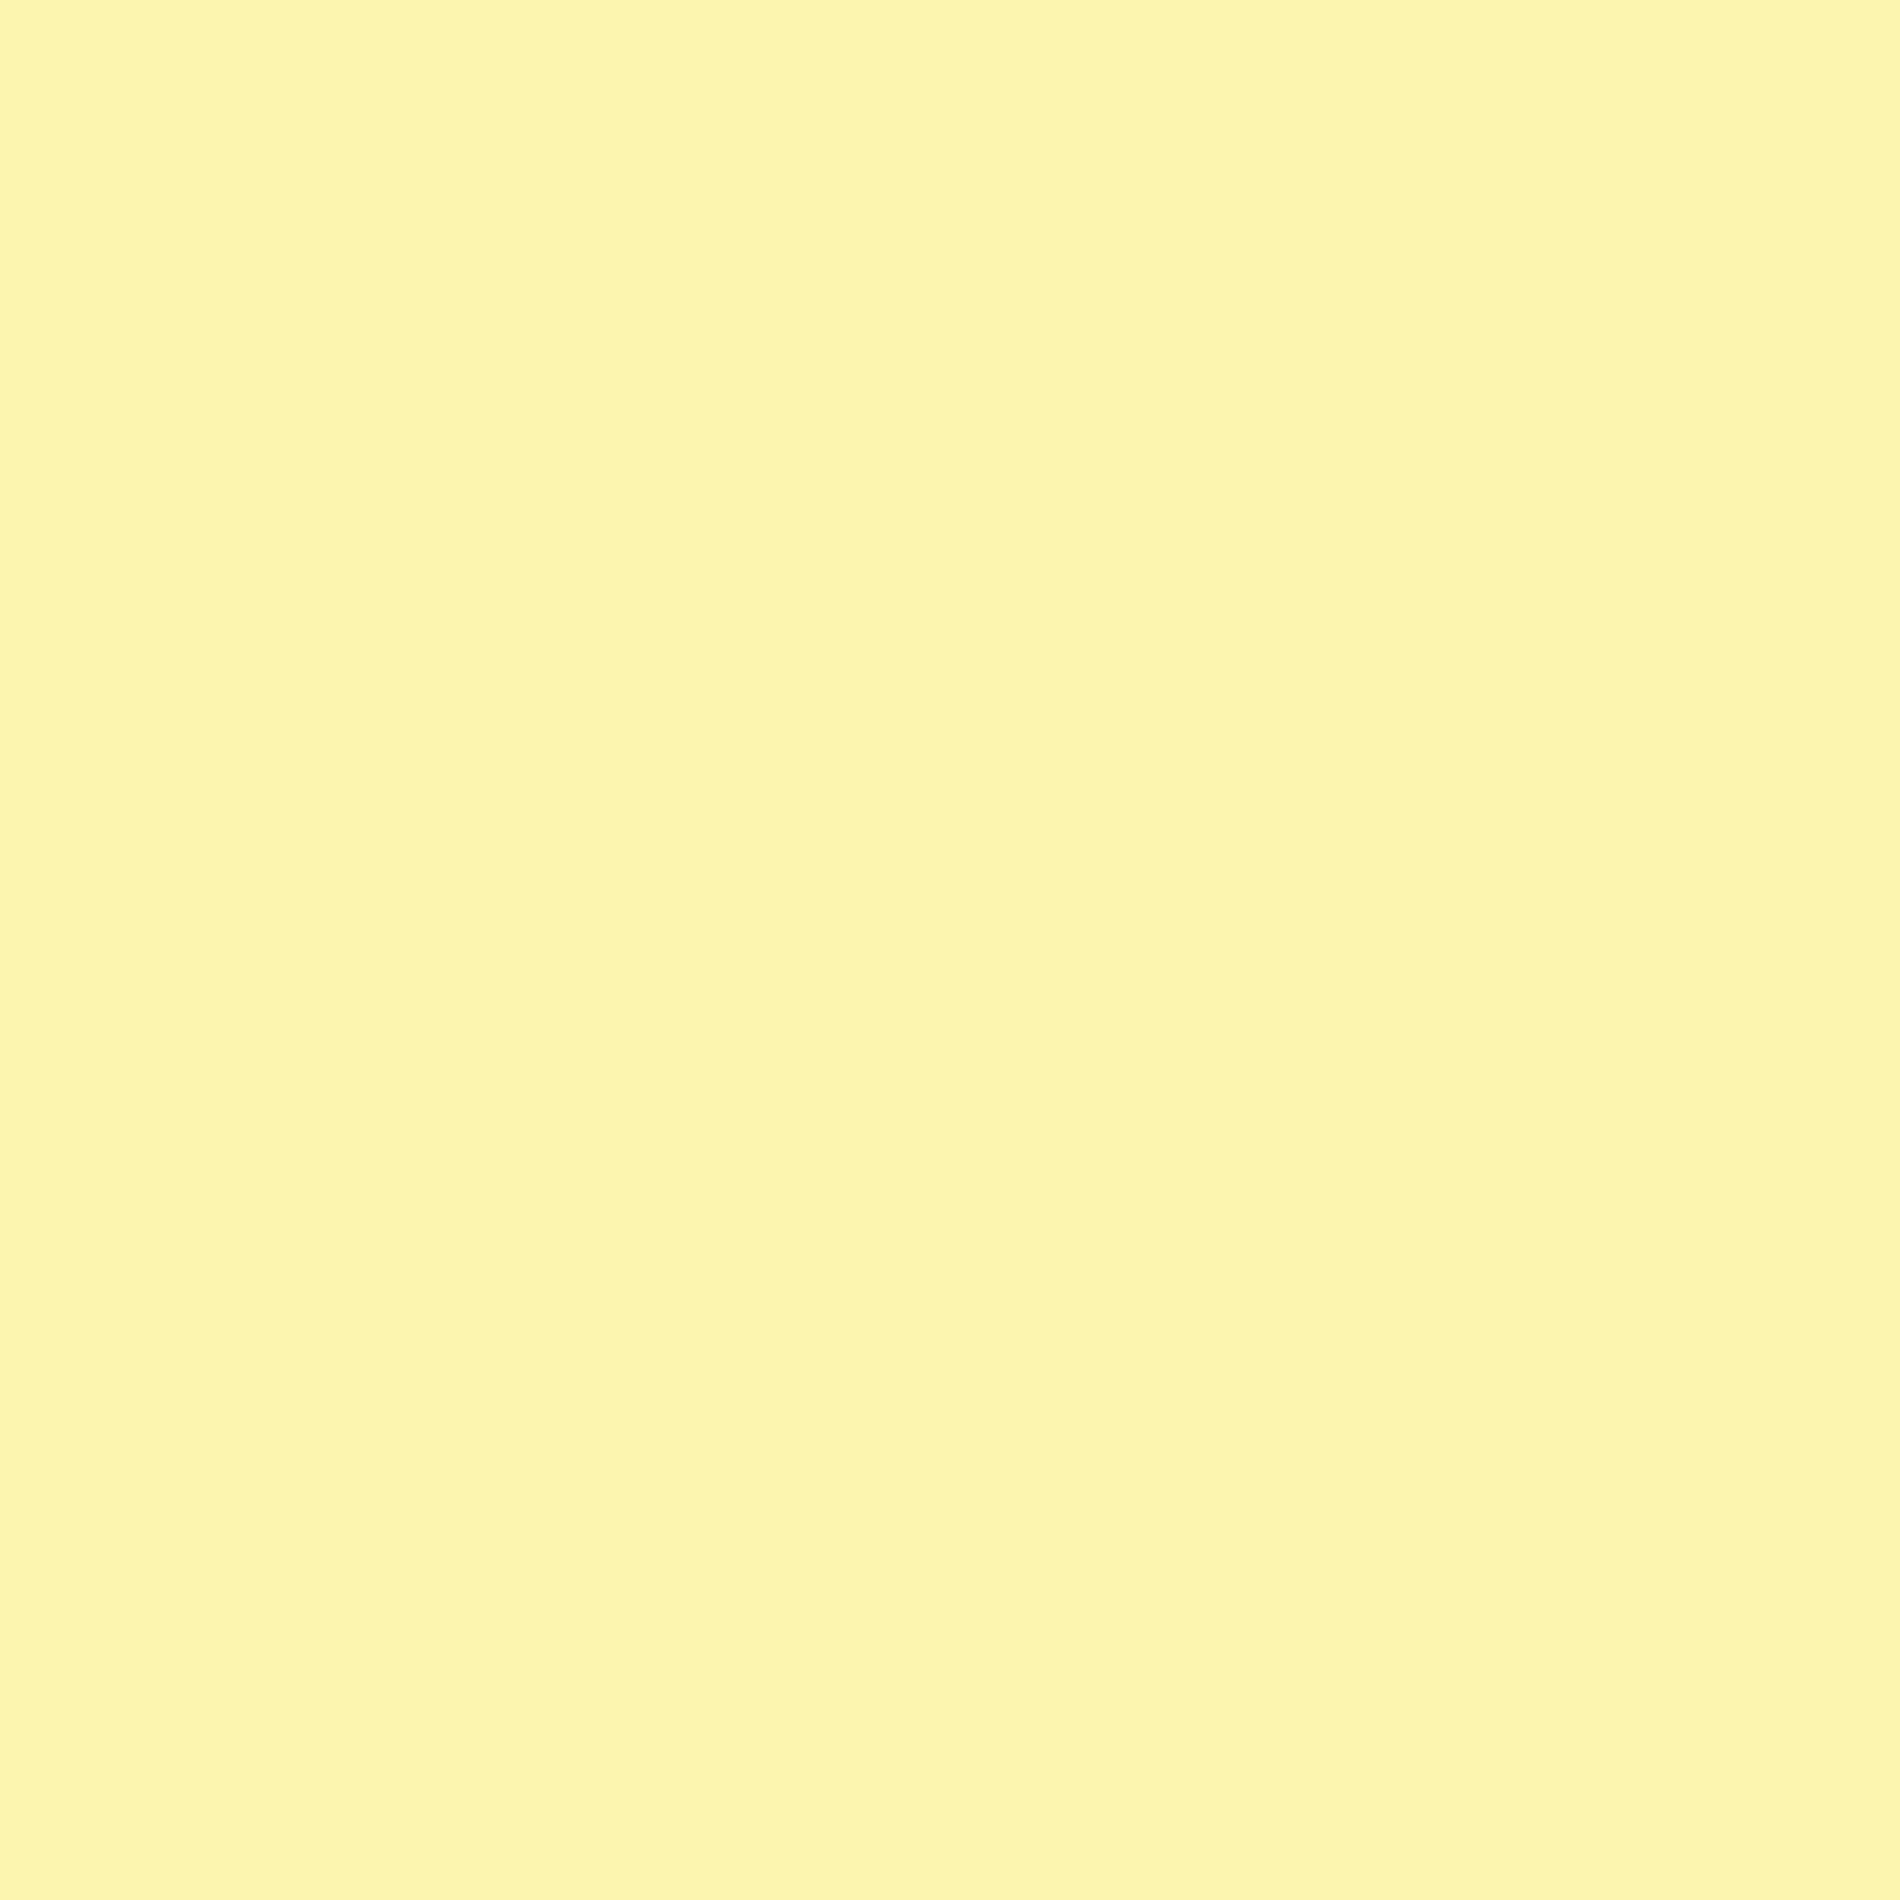 40 - lemon